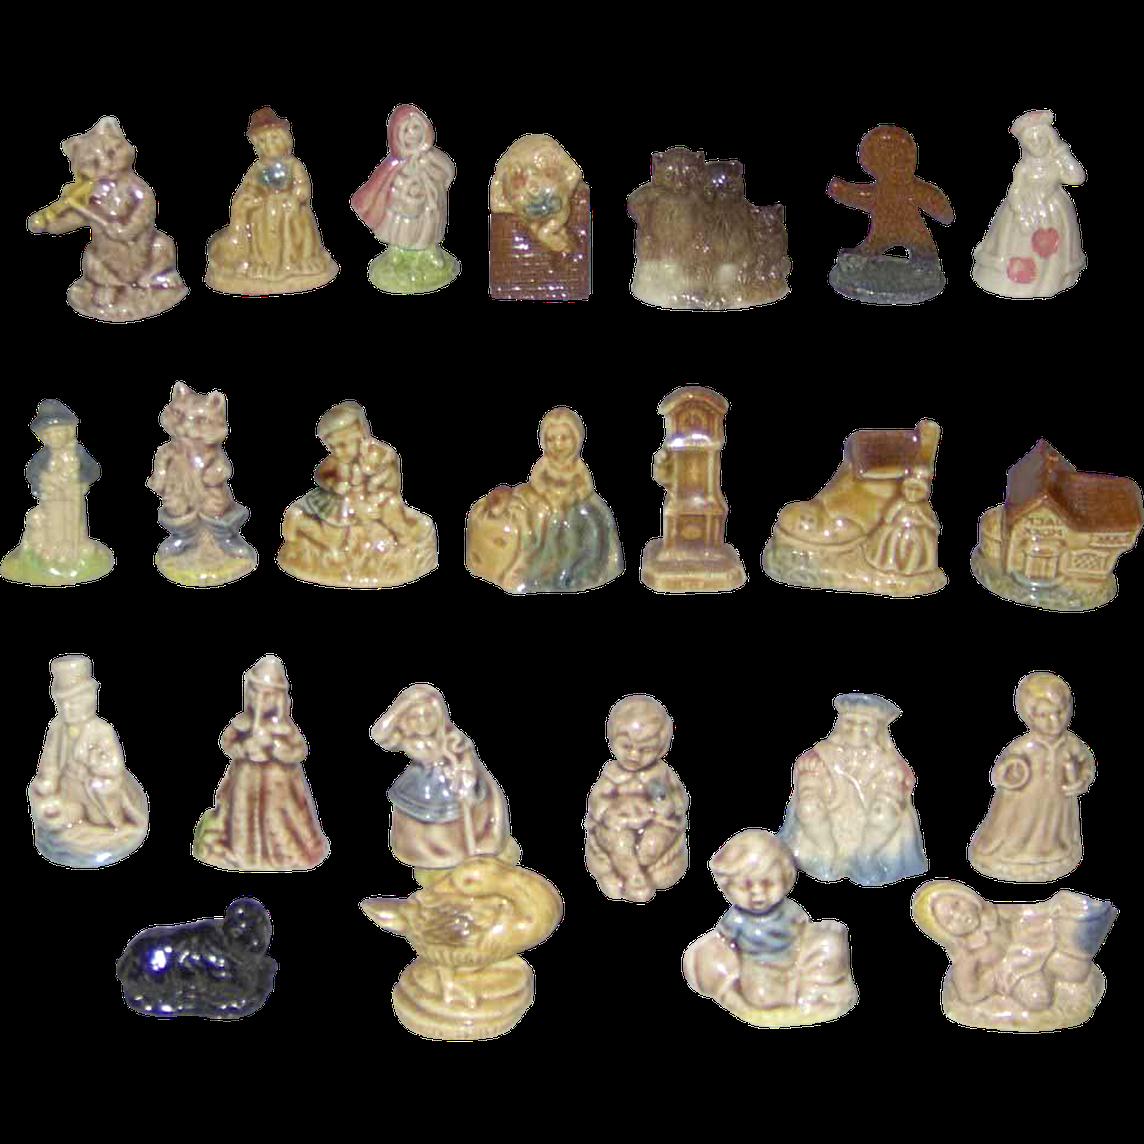 wade nursery figurines for sale